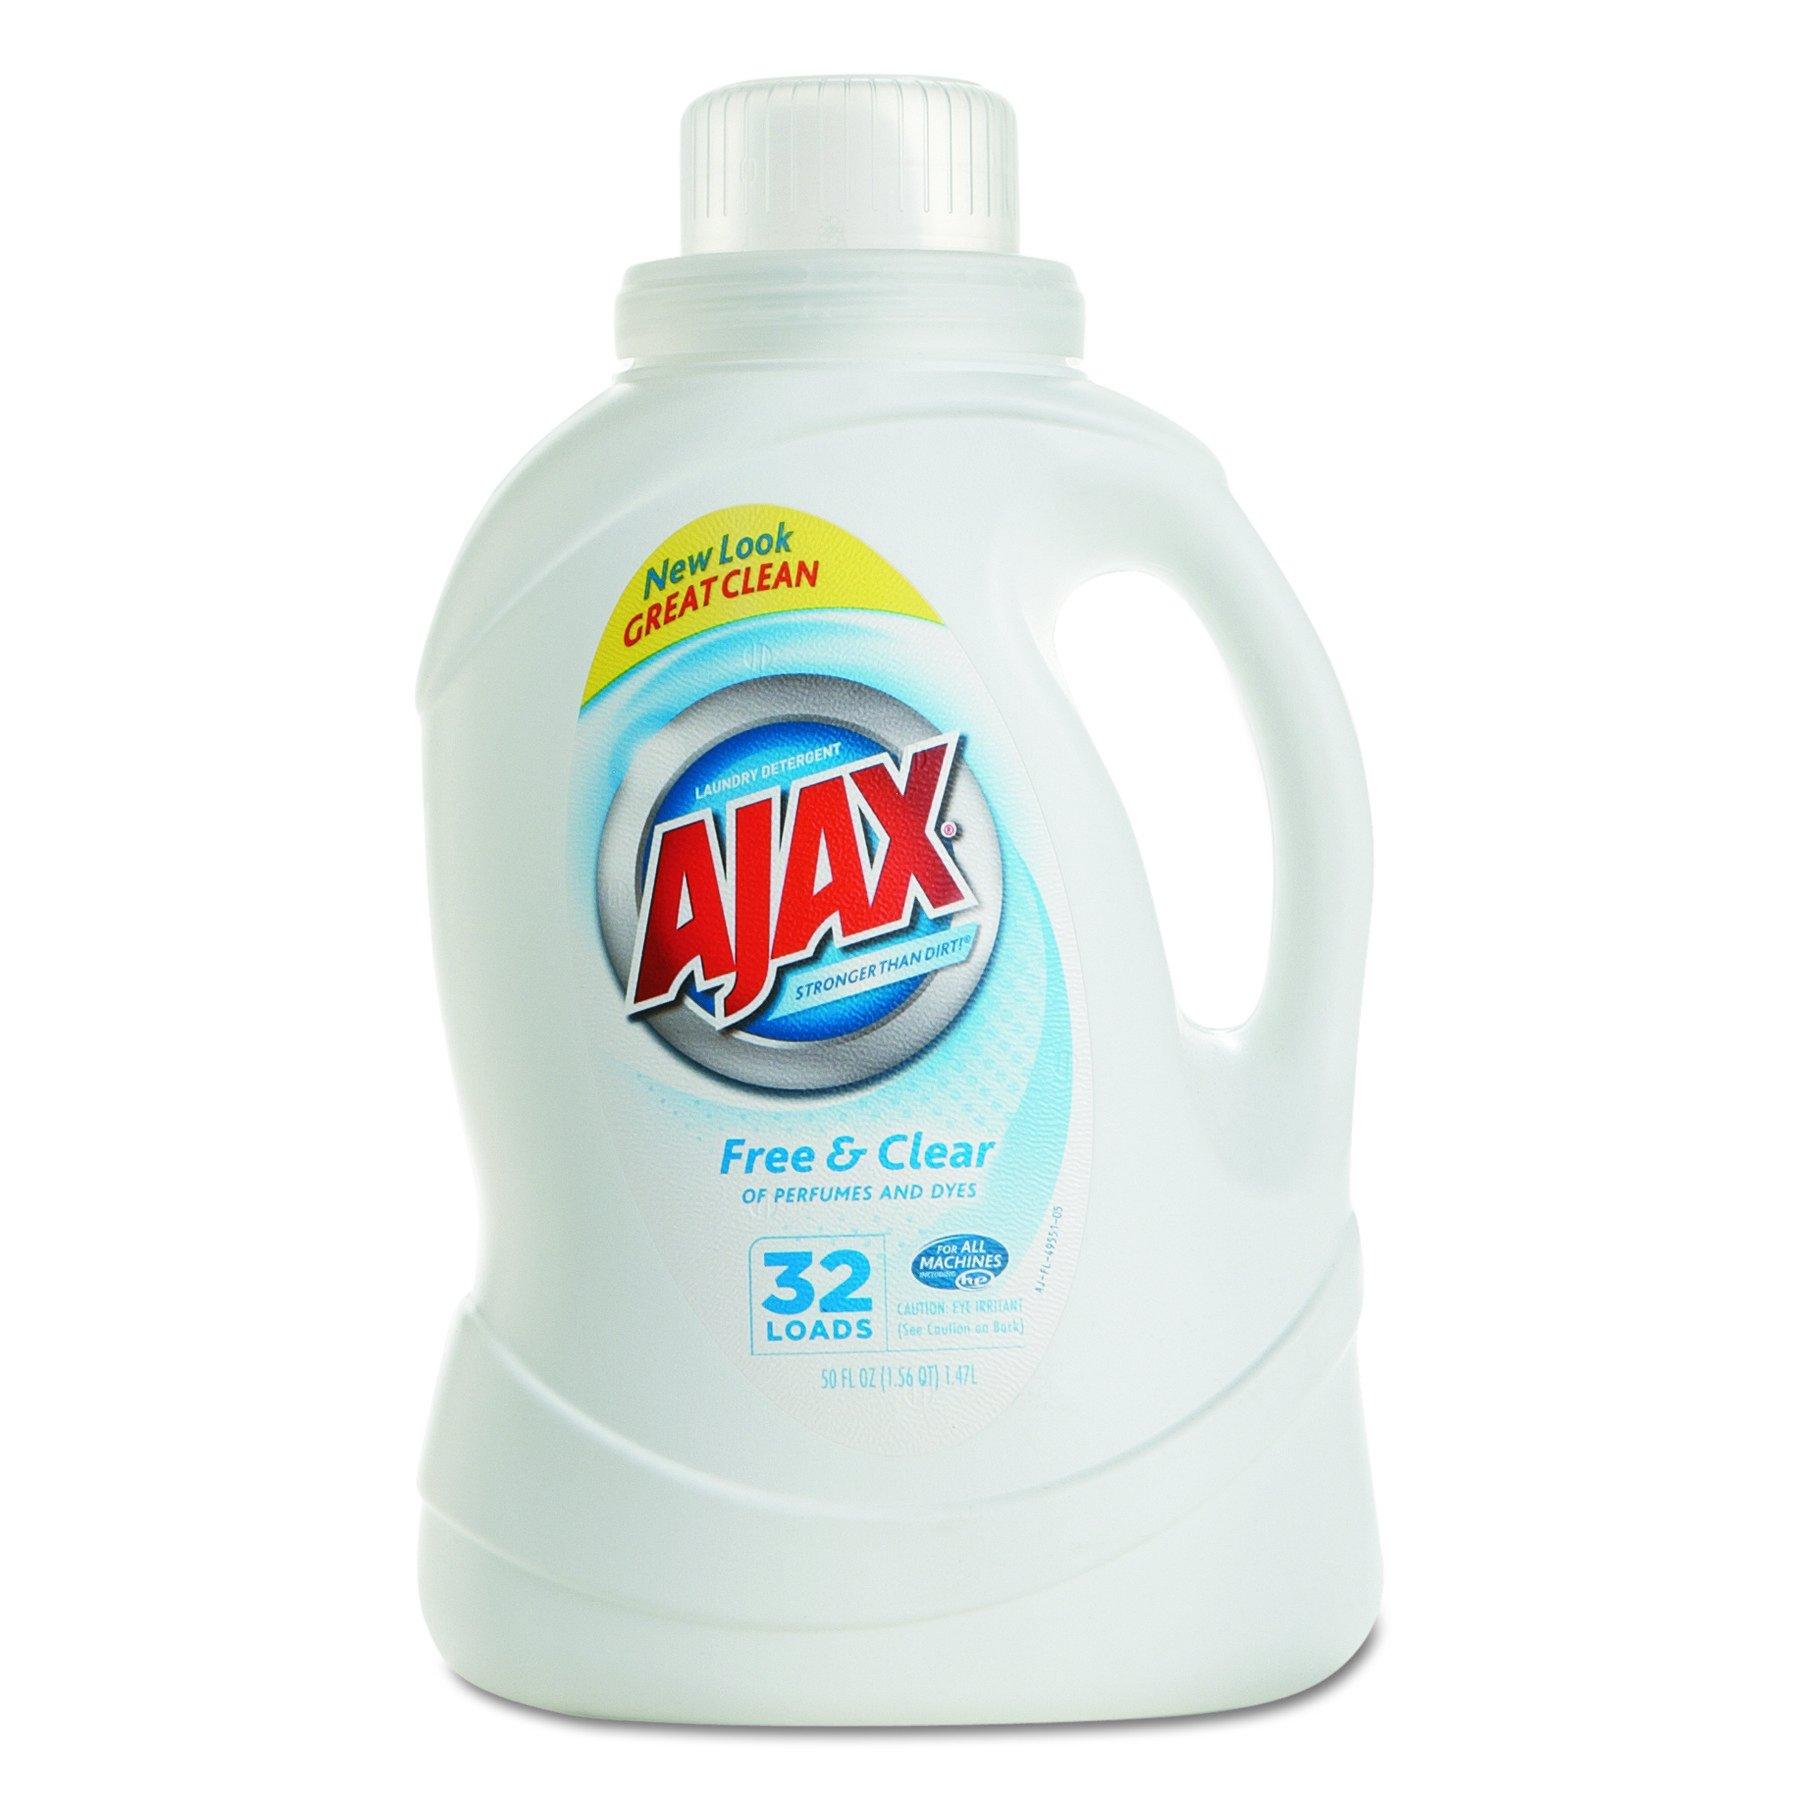 Ajax 49551 2Xultra Liquid Detergent, Free & Clear, 50oz Bottle (Case of 6)